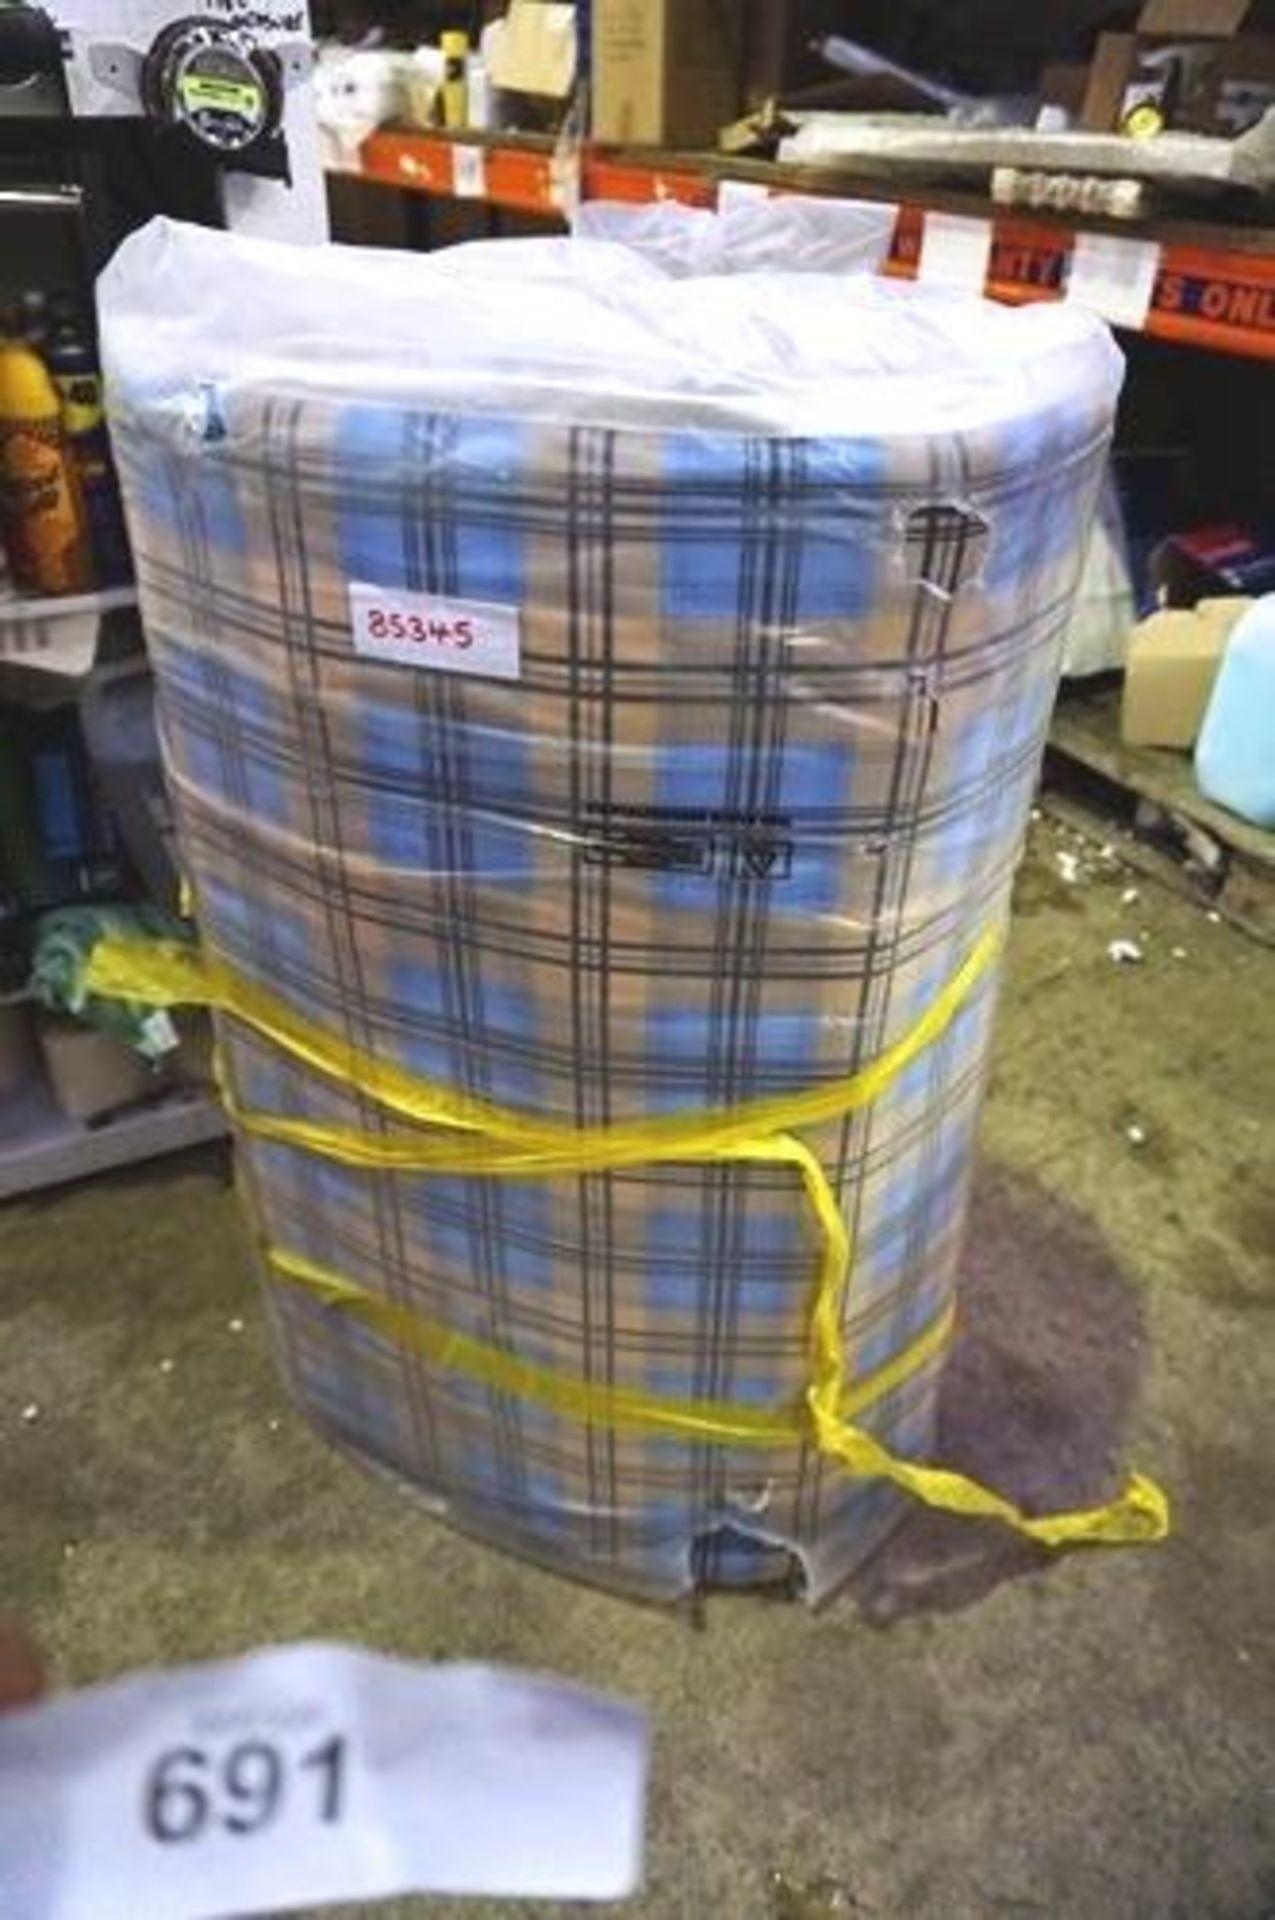 Lot 691 - 1 x Wayfair Essential 90cm x 190cm single mattress - Sealed new (GSF10)